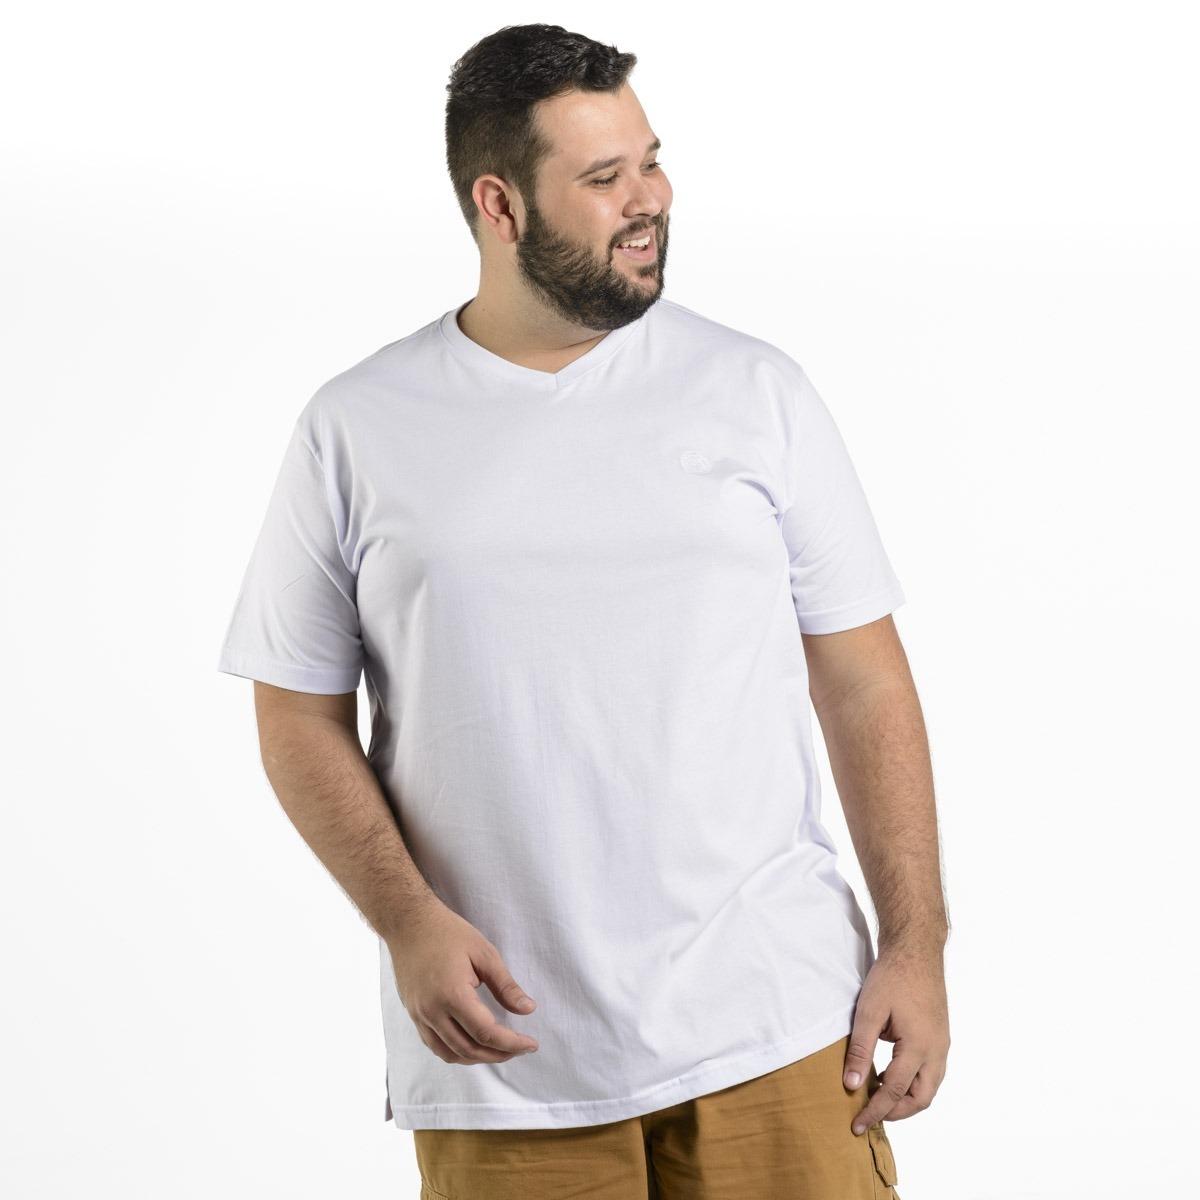 7e0d8d3421 camiseta plus size masculina lisa bordada gola v mais pano. Carregando zoom.